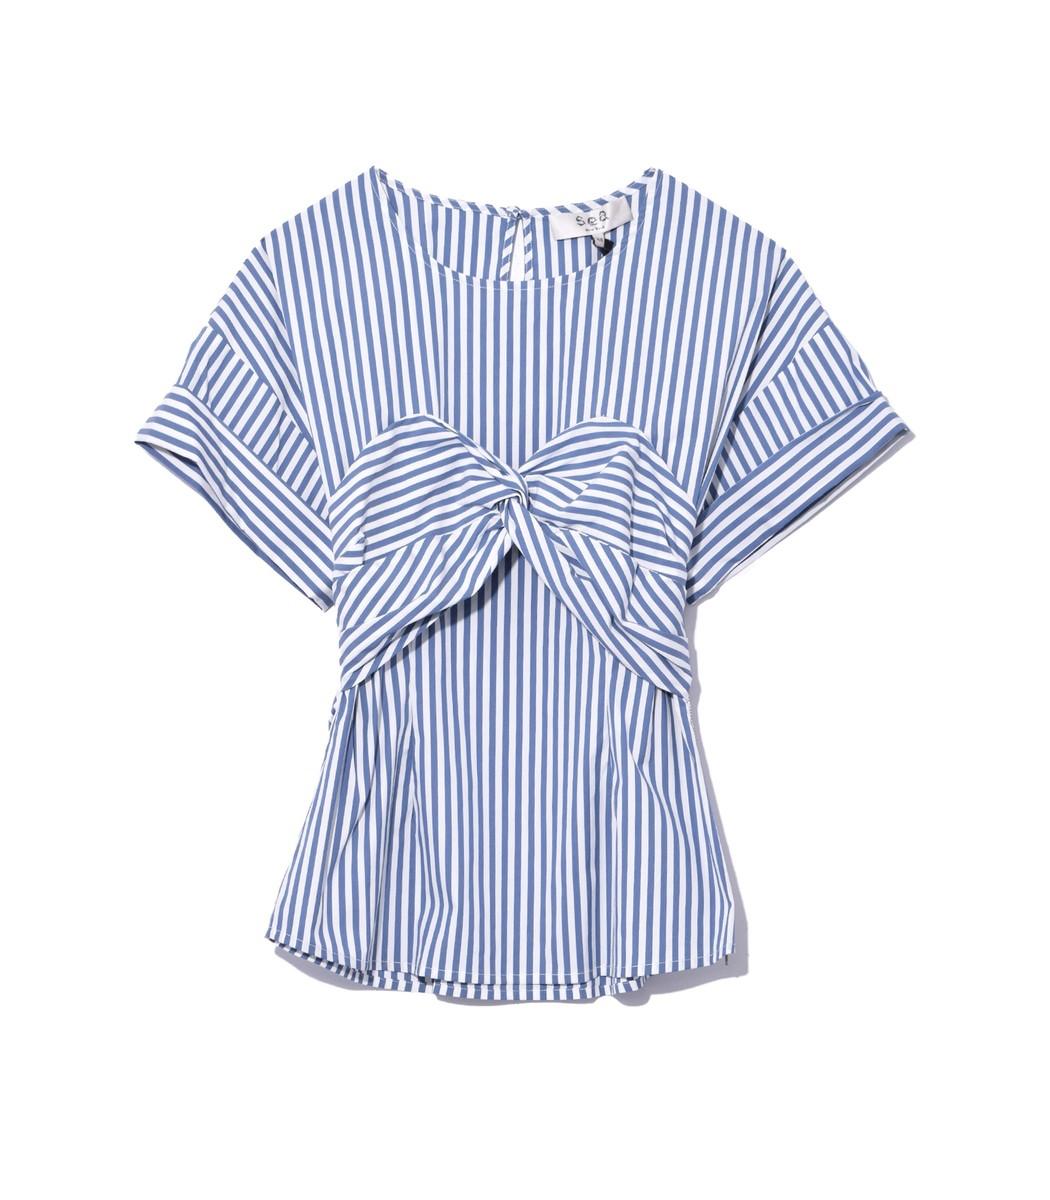 SEA White/Blue Stripe Corset Tee